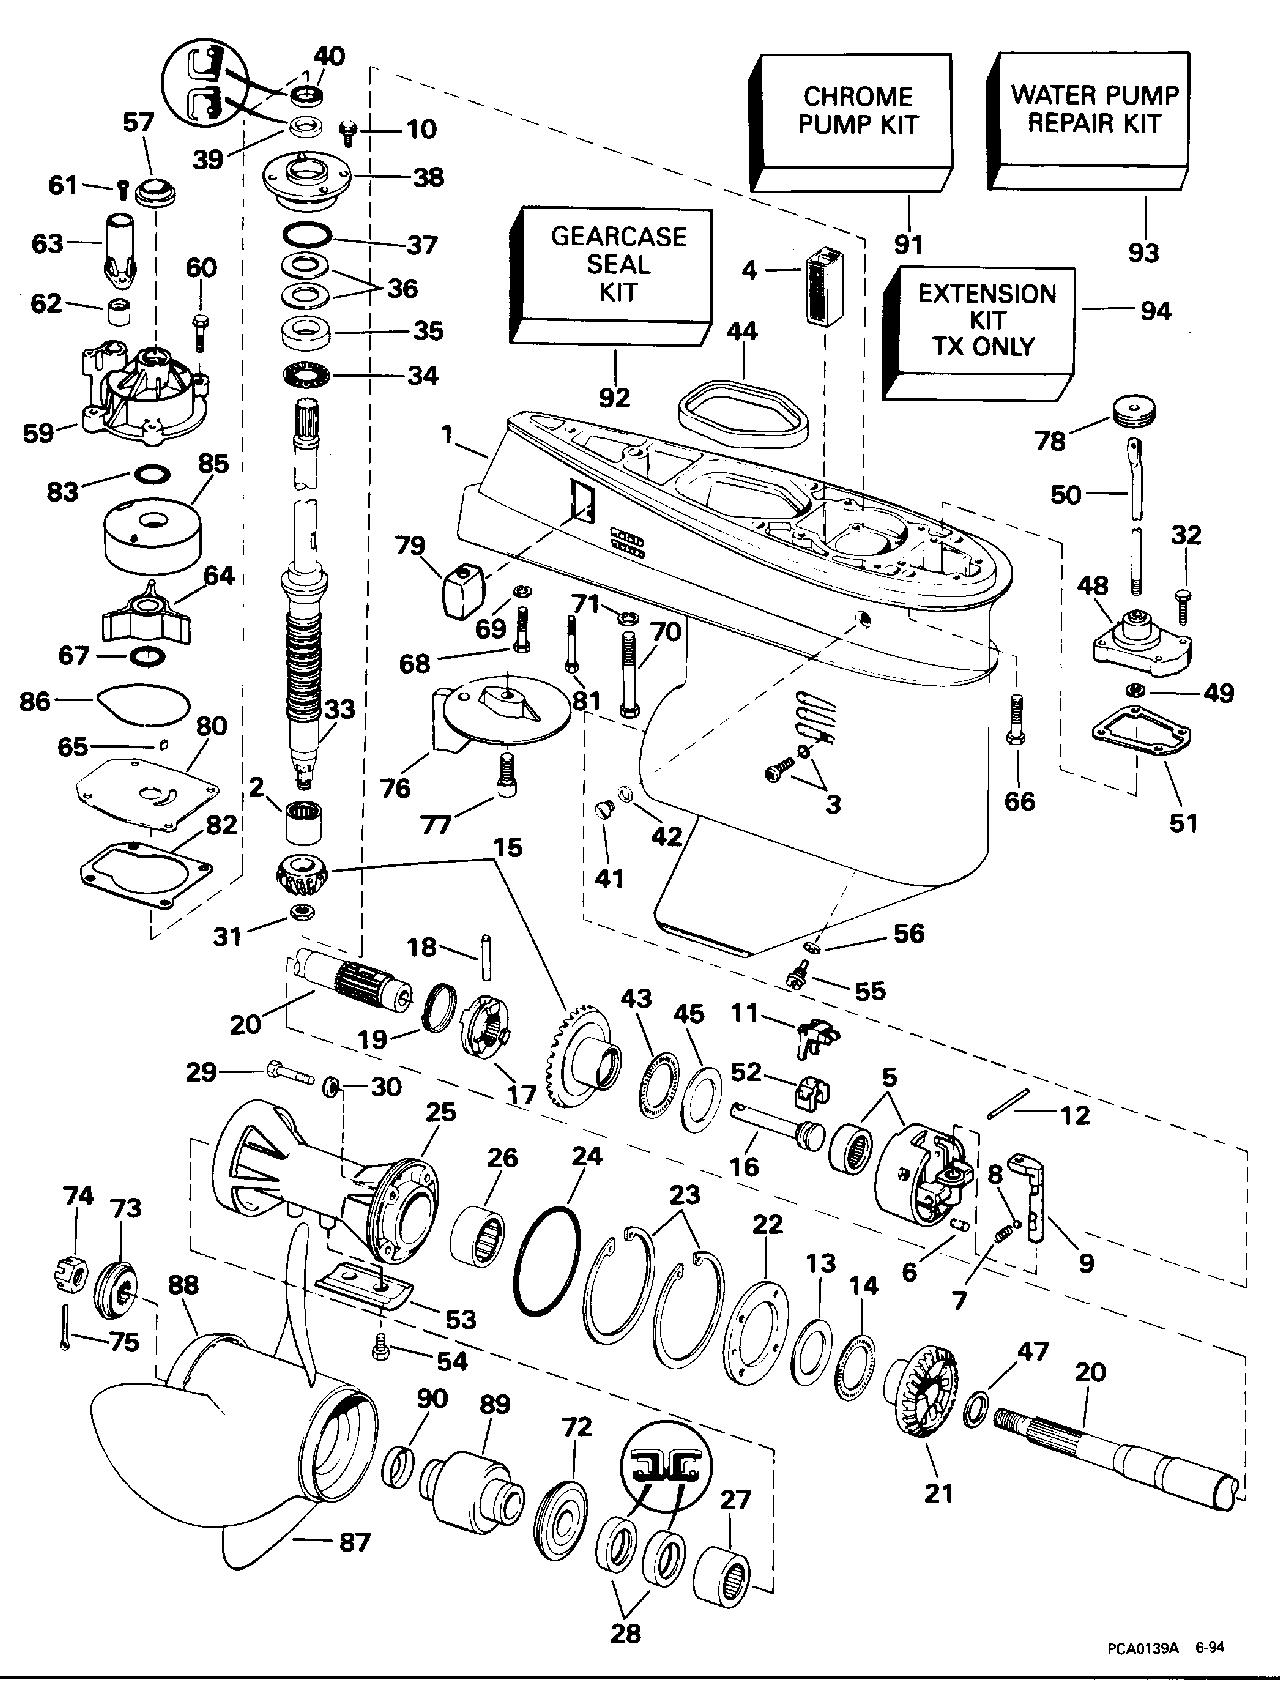 evinrude 70 wiring diagram database Mercury Wiring Diagrams evinrude 70 wiring diagram database evinrude 70 hp outboard